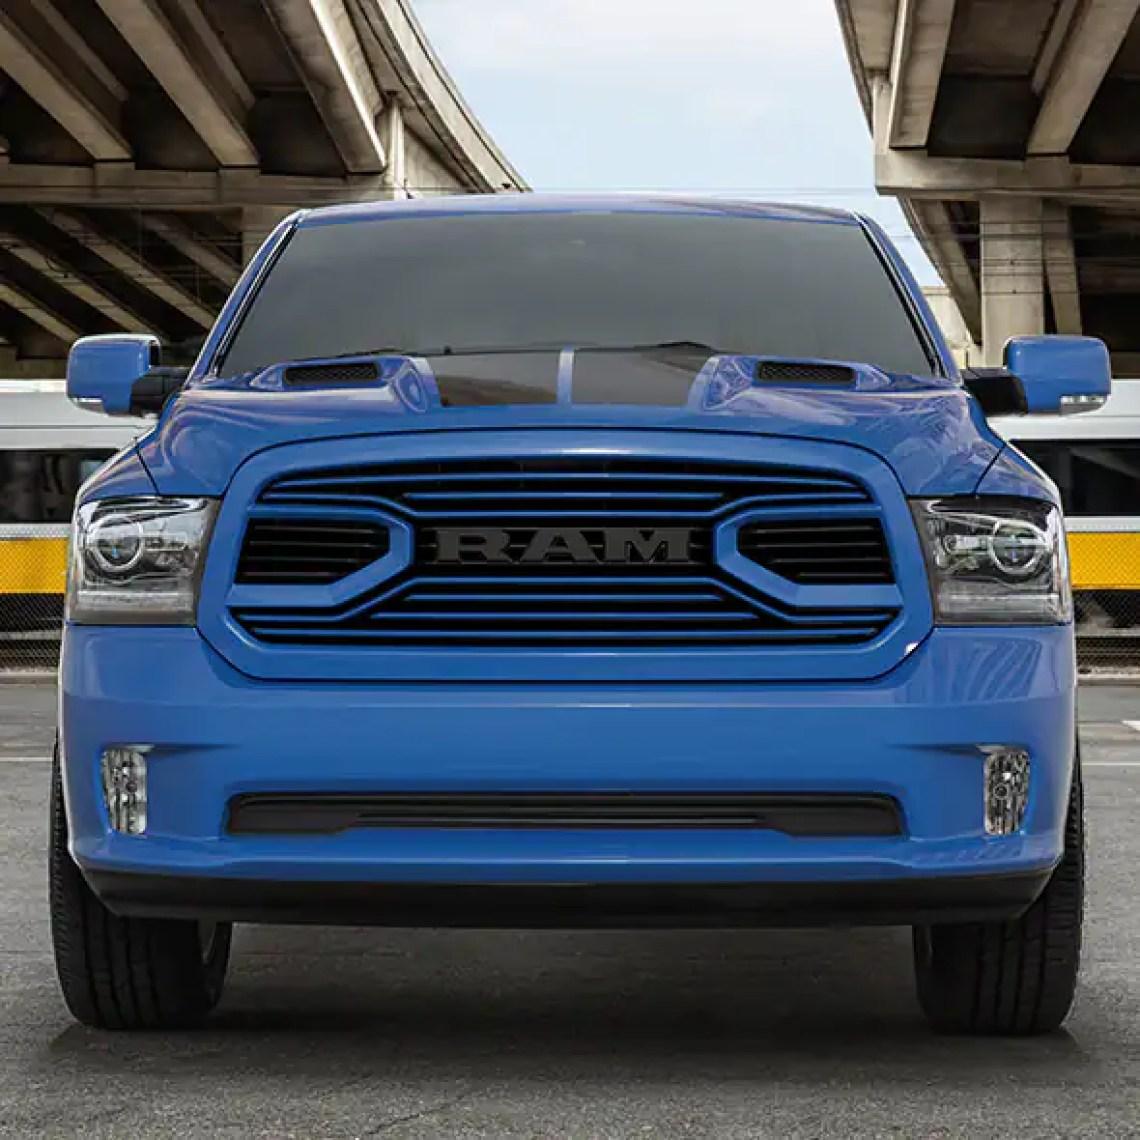 Hydro Blue Ram 1500 >> 2018 Dodge Ram 1500 First Drive | Car Models 2018 - 2019